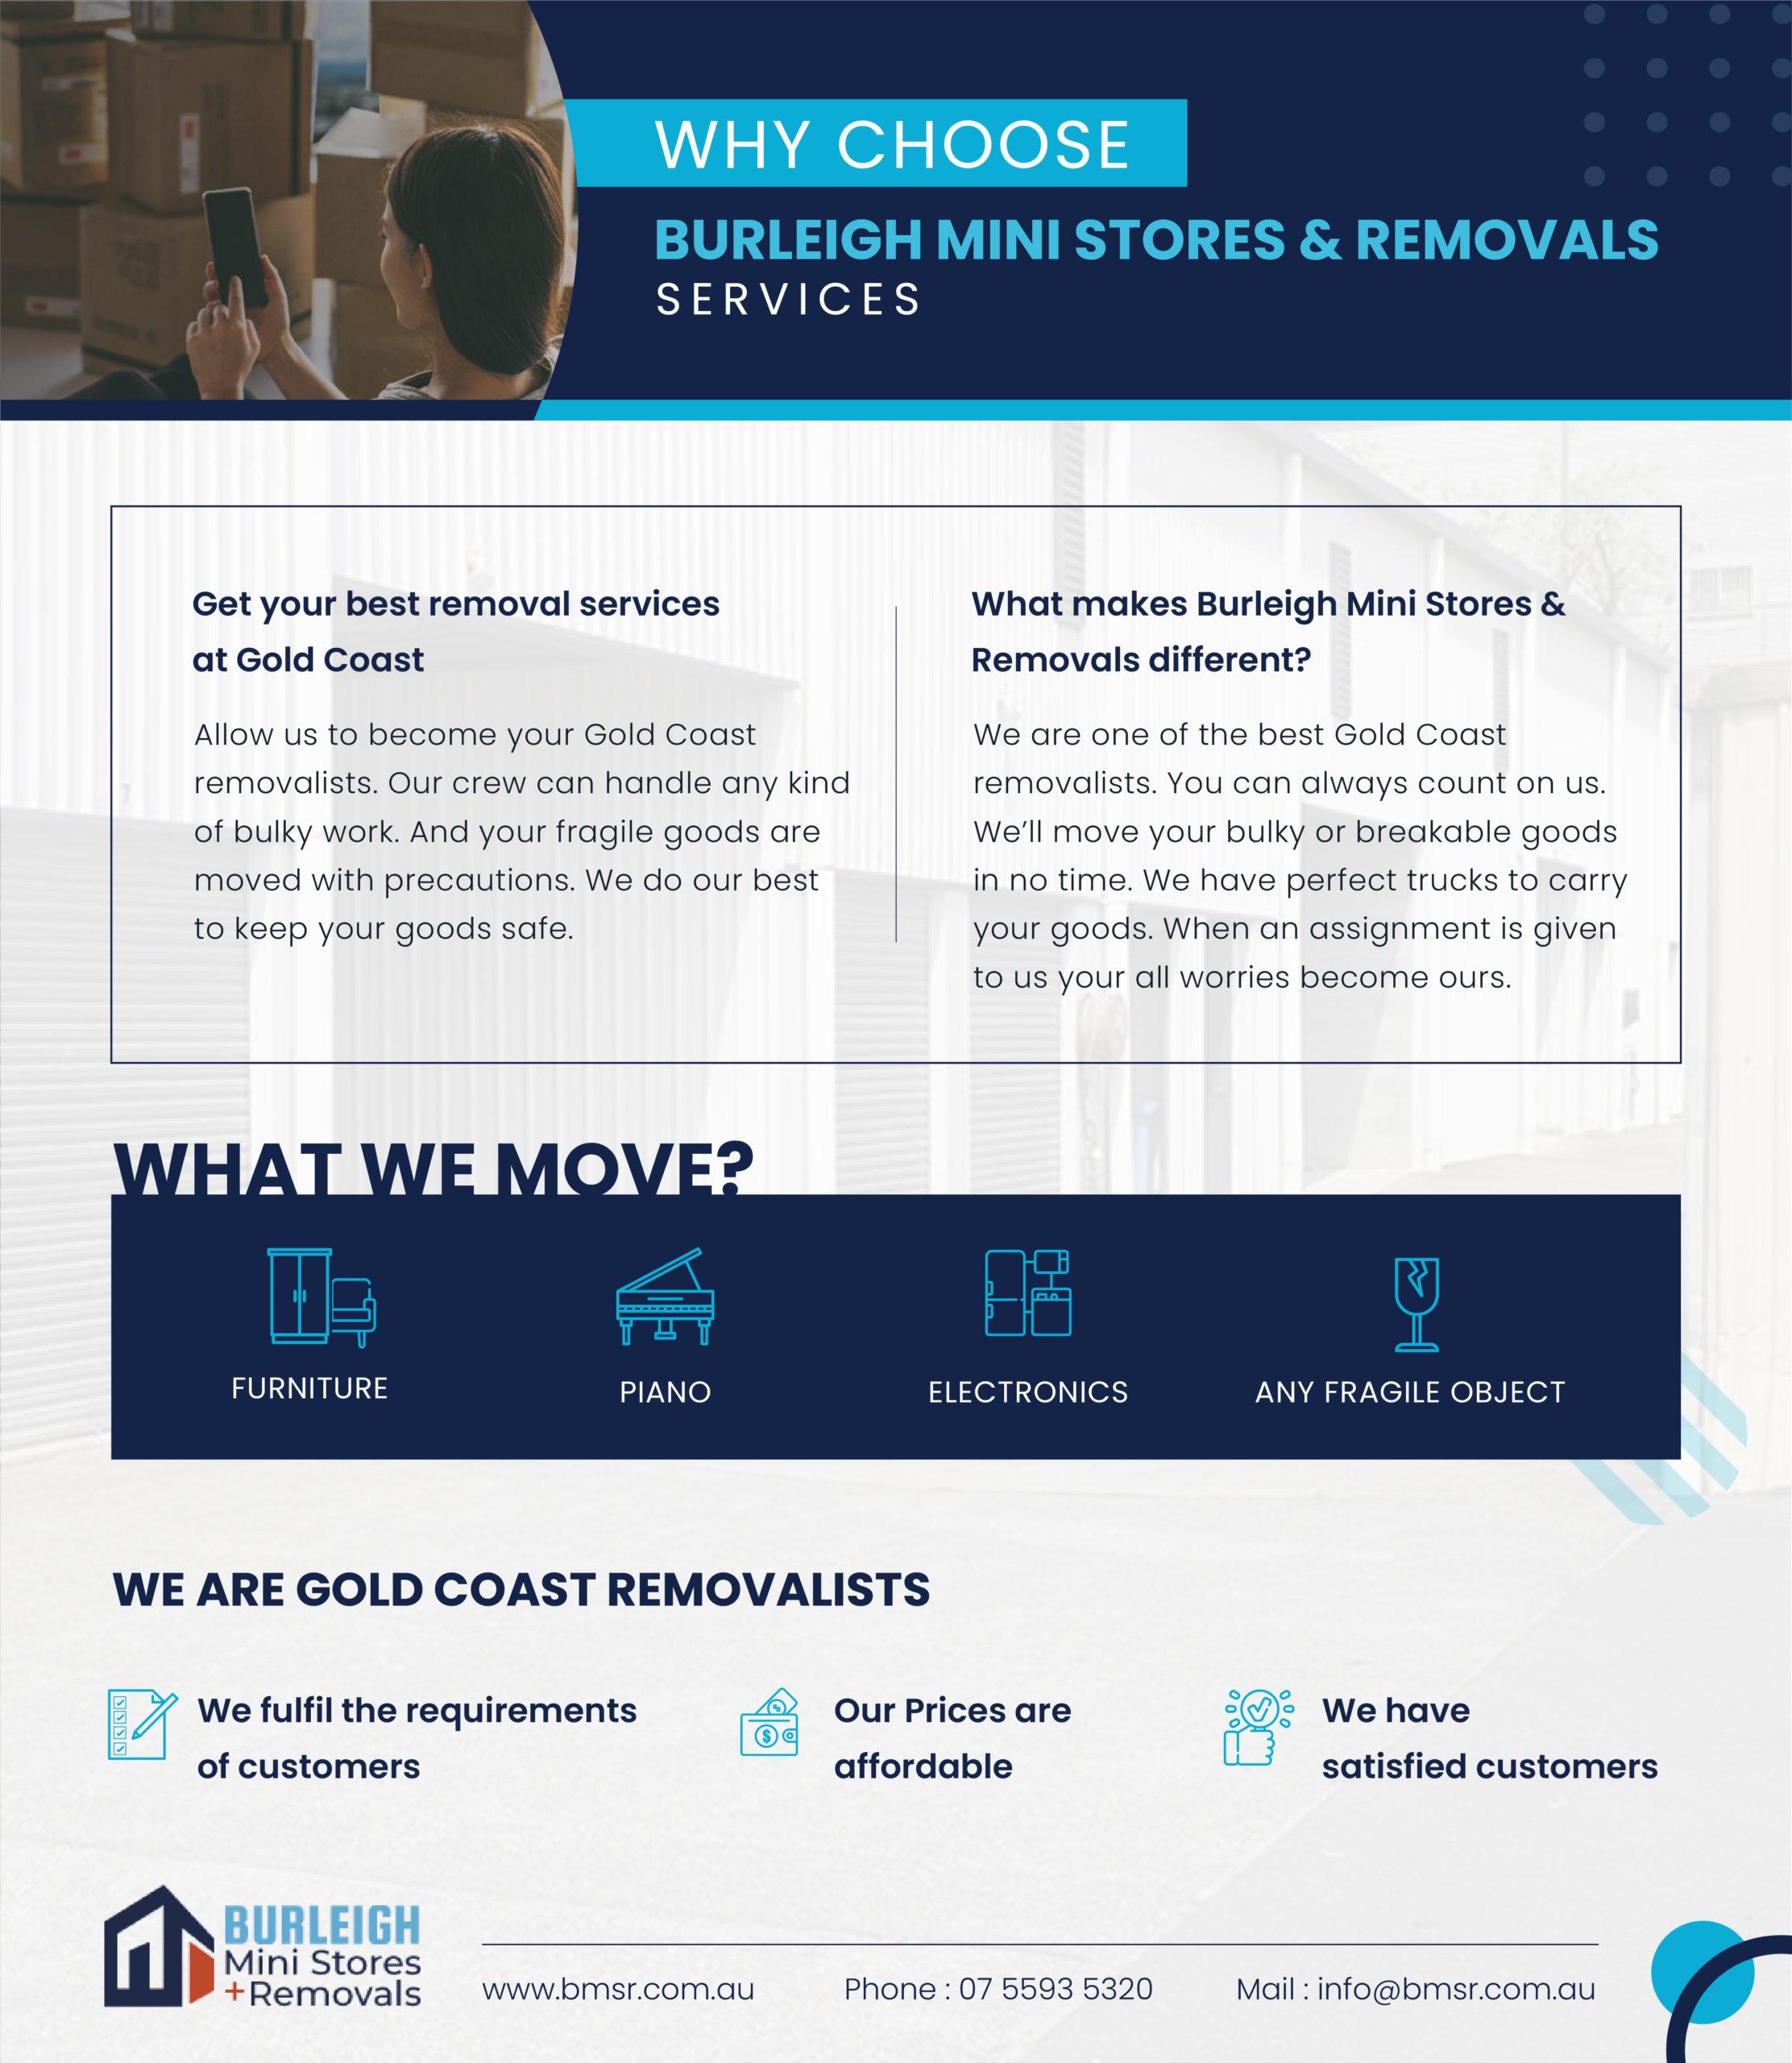 Burleigh Mini Stores & Removals storage